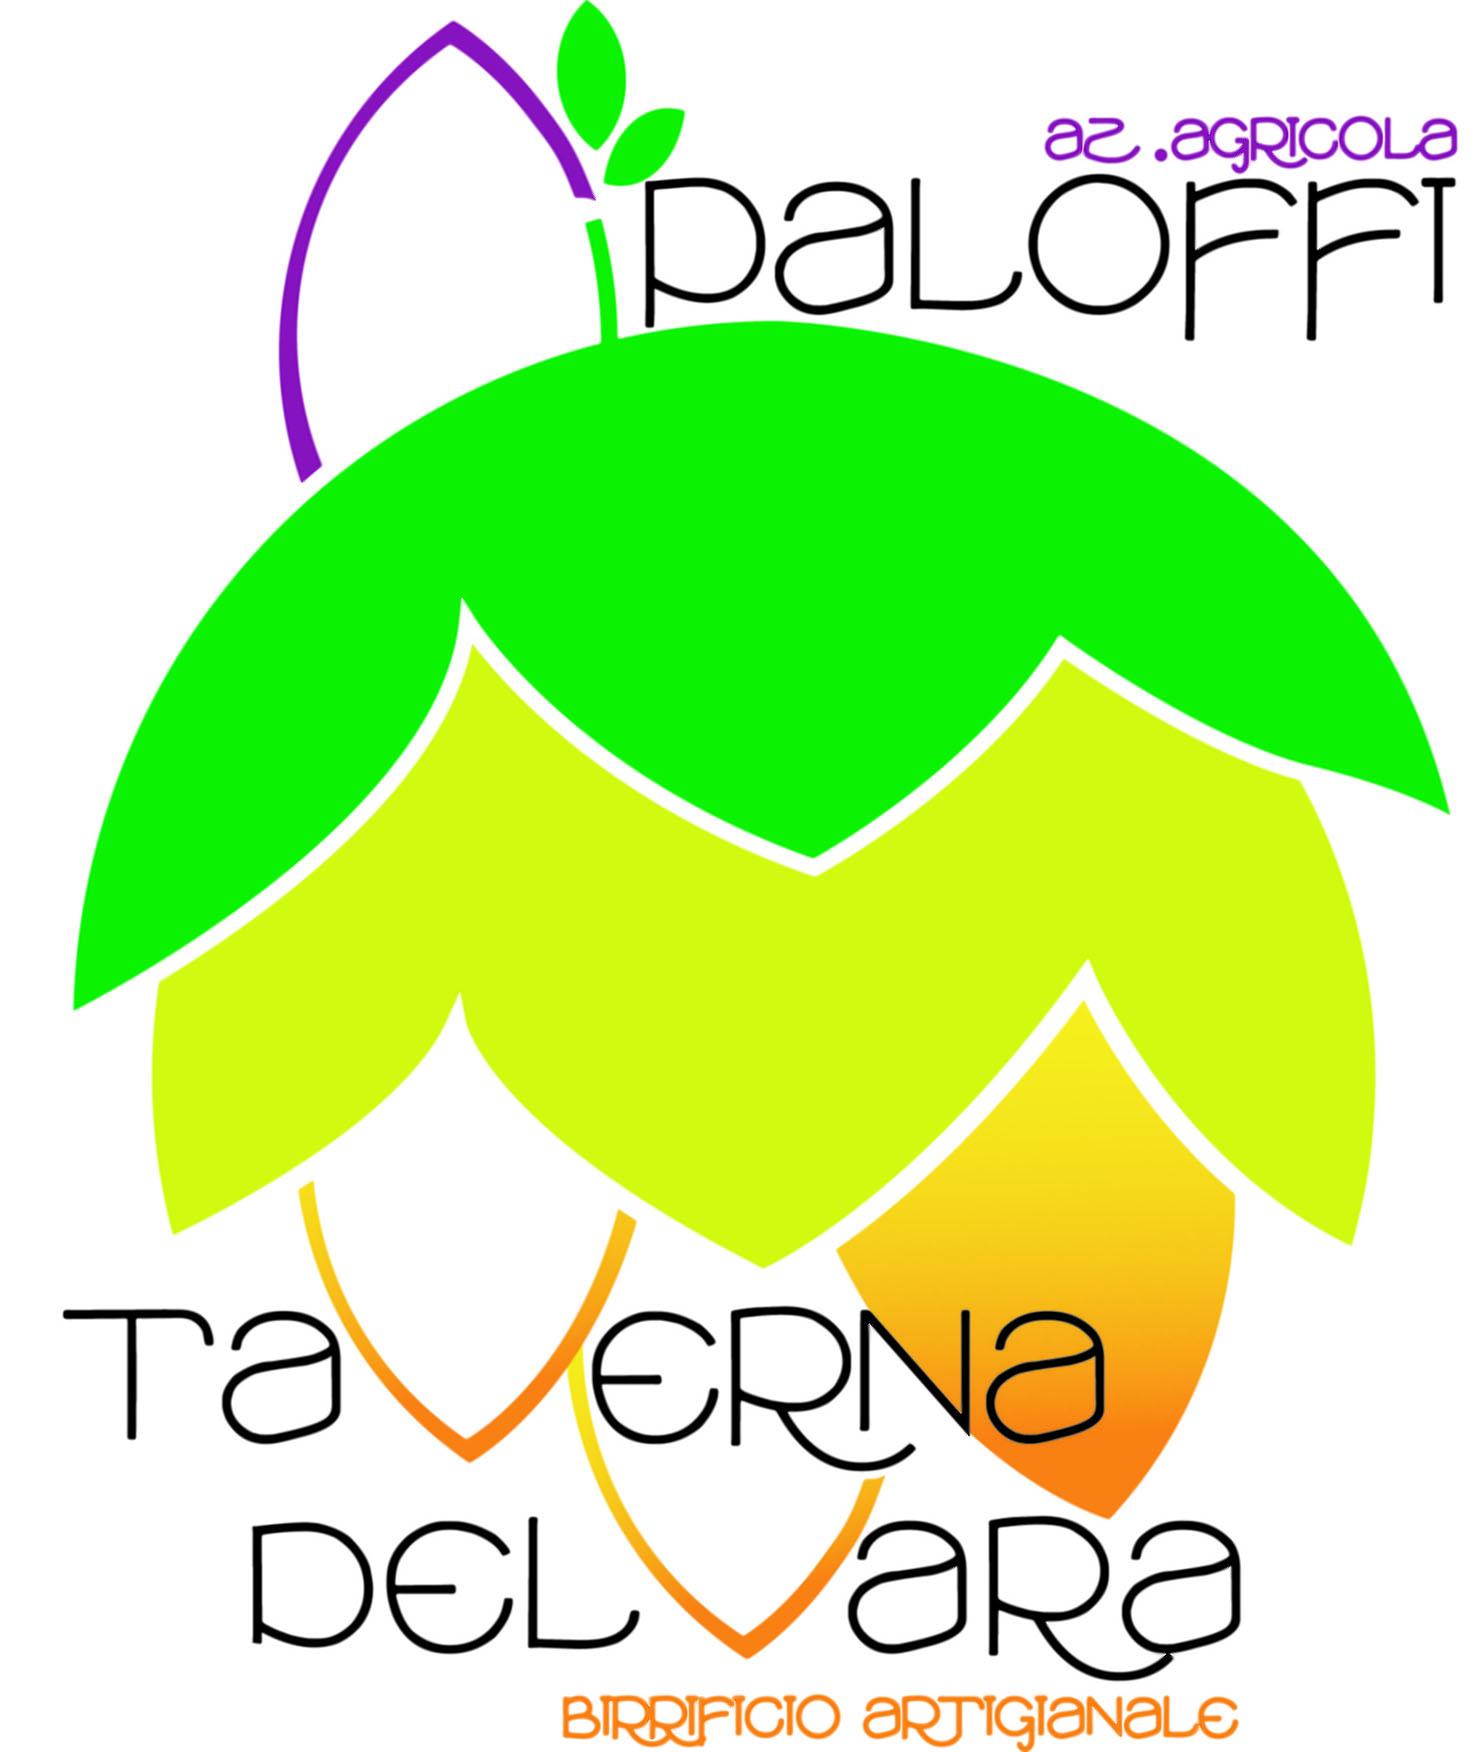 Aperitivo I Paloffi